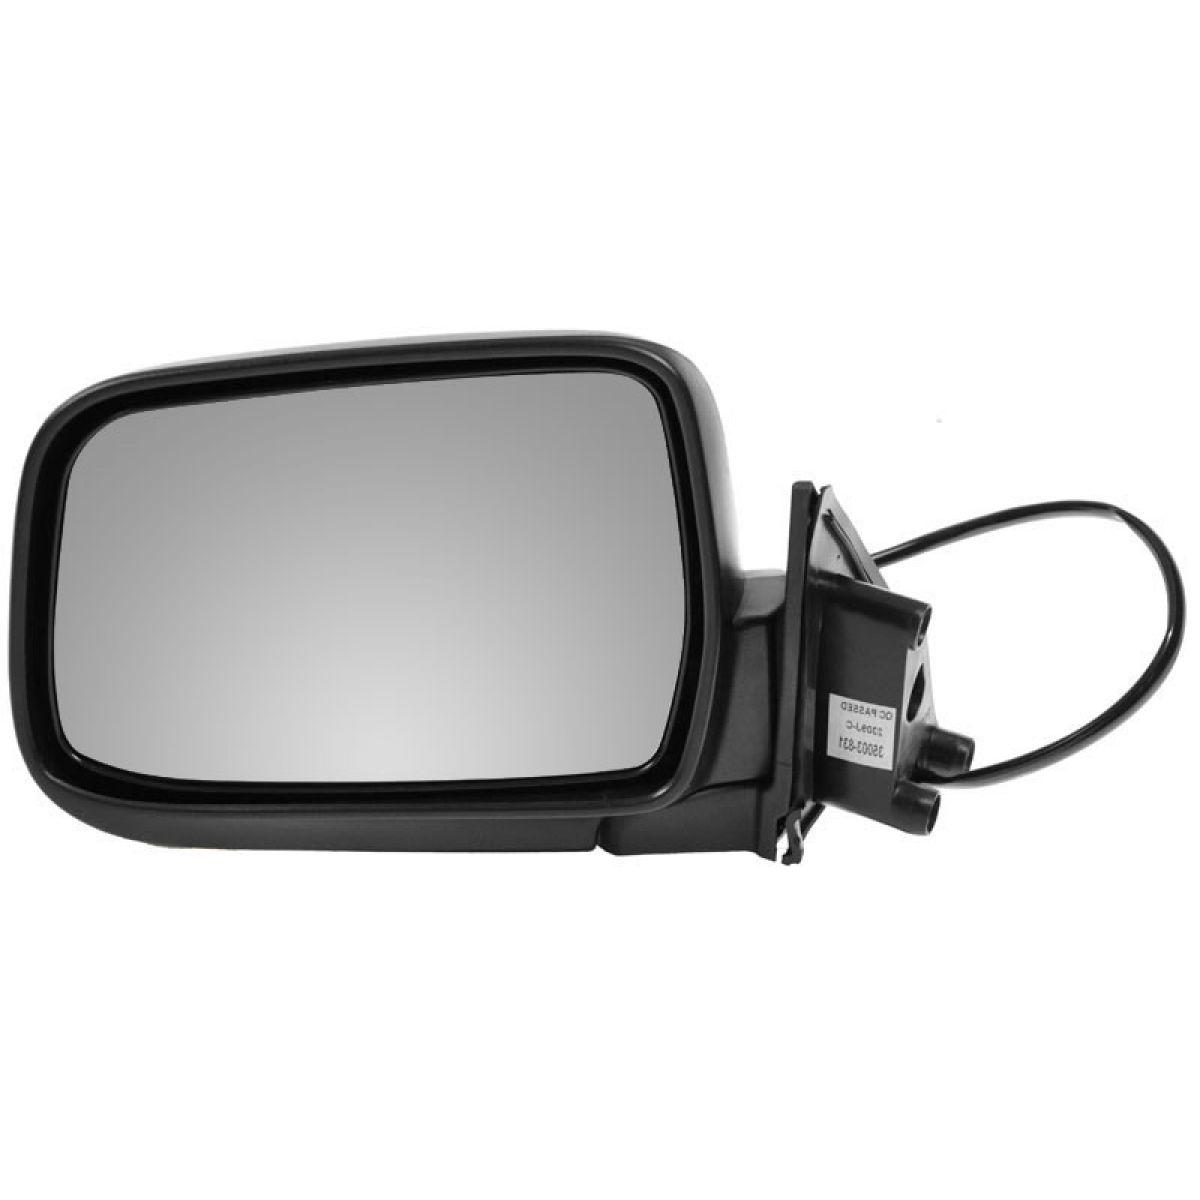 Power Manual Folding Left Side Mirror Fits 98-01 2002 2003 2004 Nissan Frontier